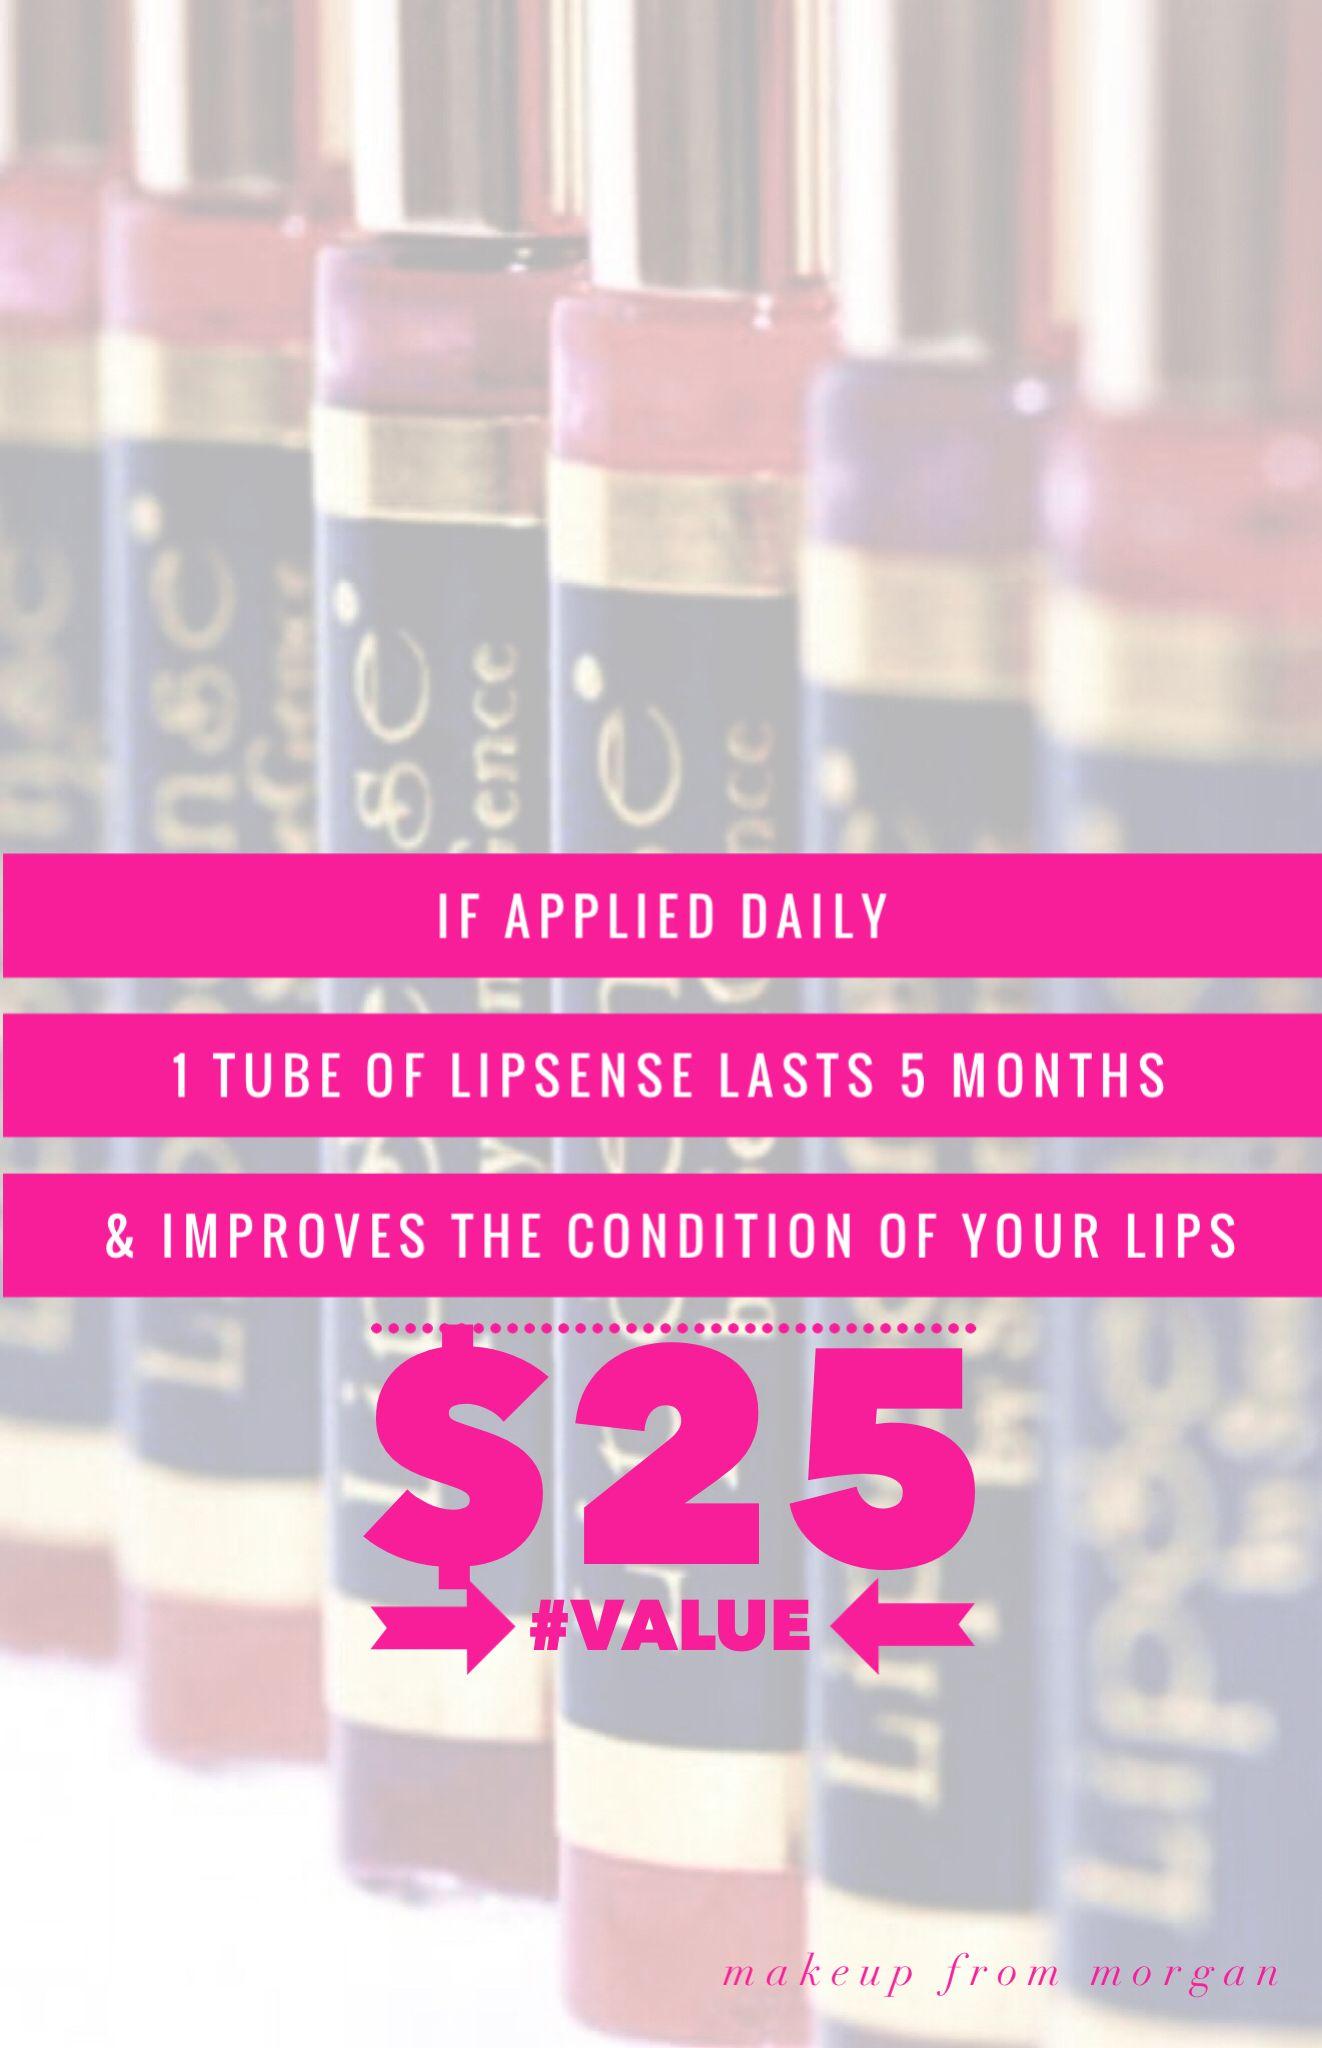 Lipsense Makeup: LipSense Lip Color Value LipSense Makeup From Morgan ID